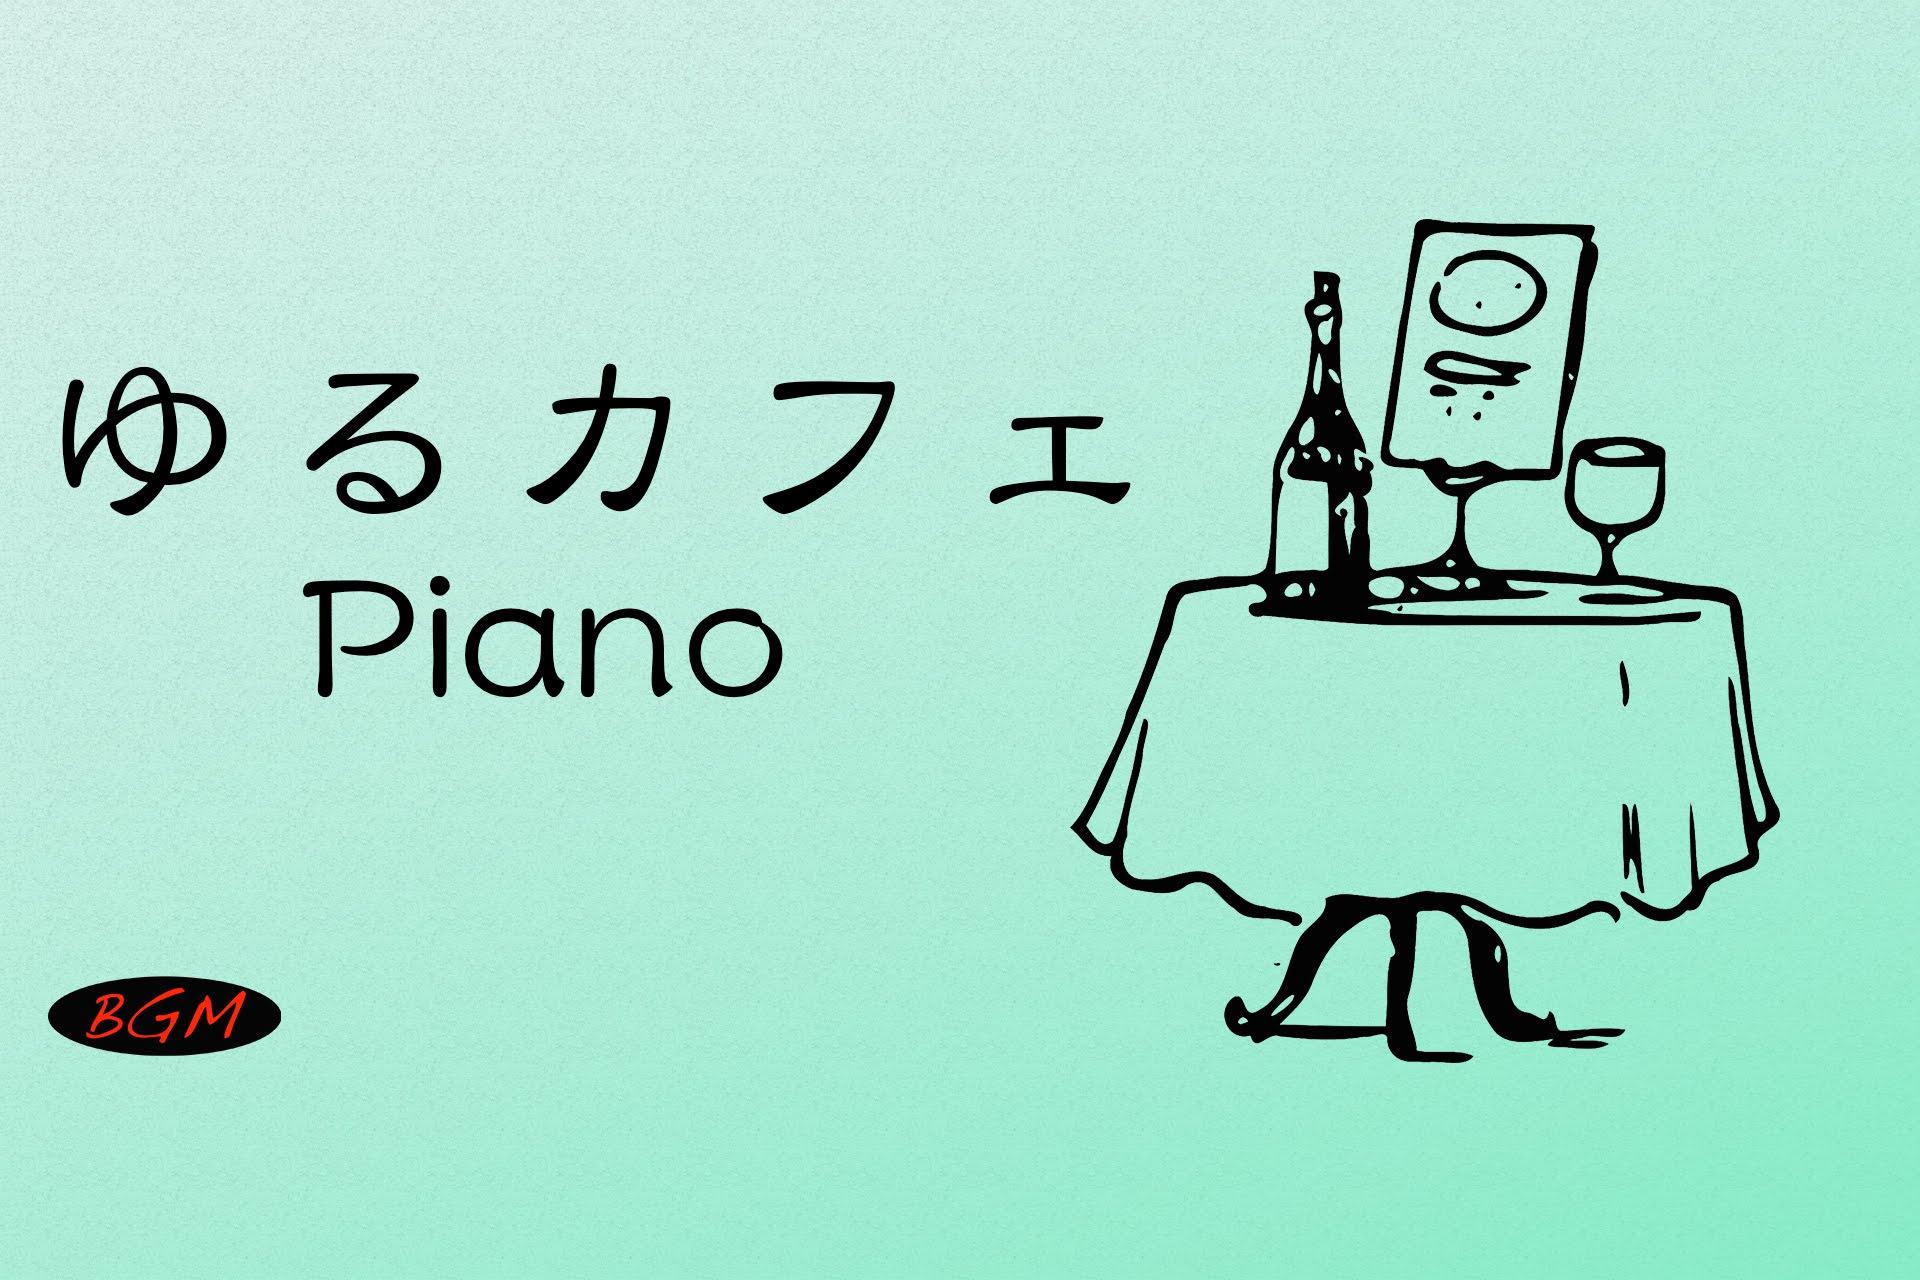 Piano clipart instrumental Nova &  Study Instrumental